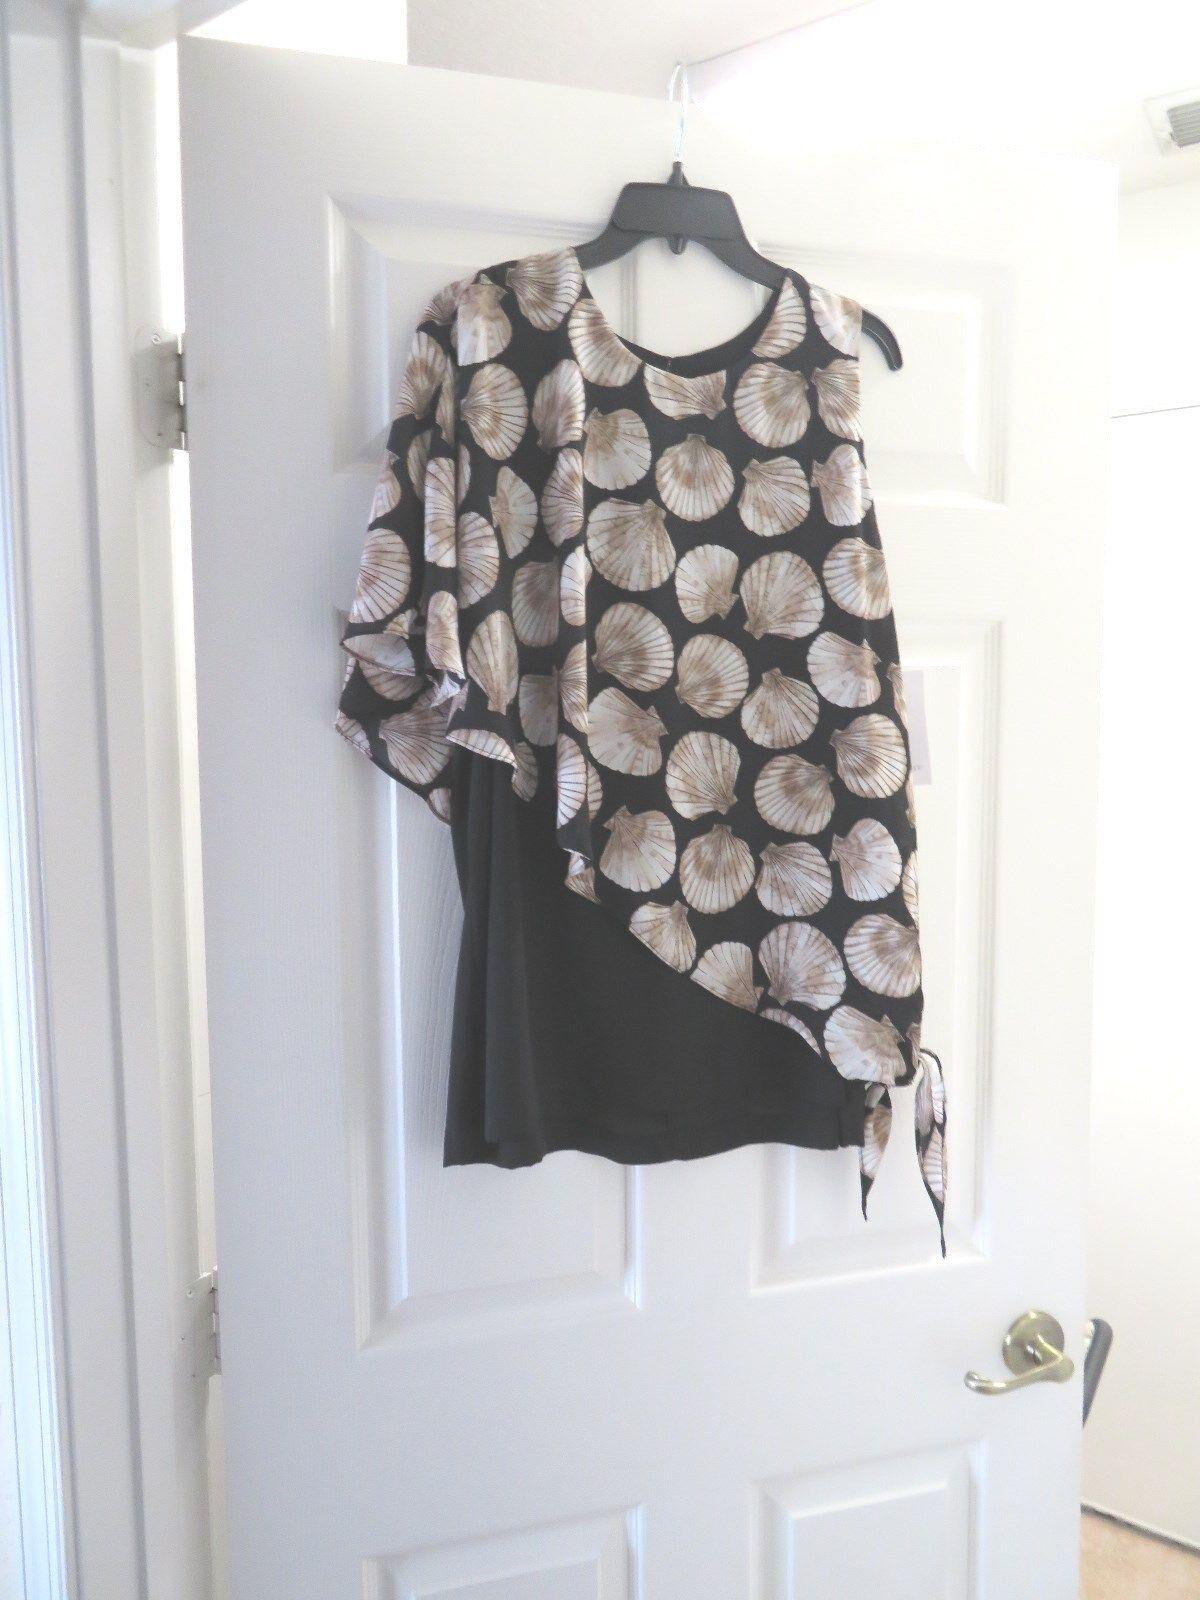 Karen Kane,Seashell, Layered ,,Unique,Short Sleeveless Top,XL,Tie At HipSlimming